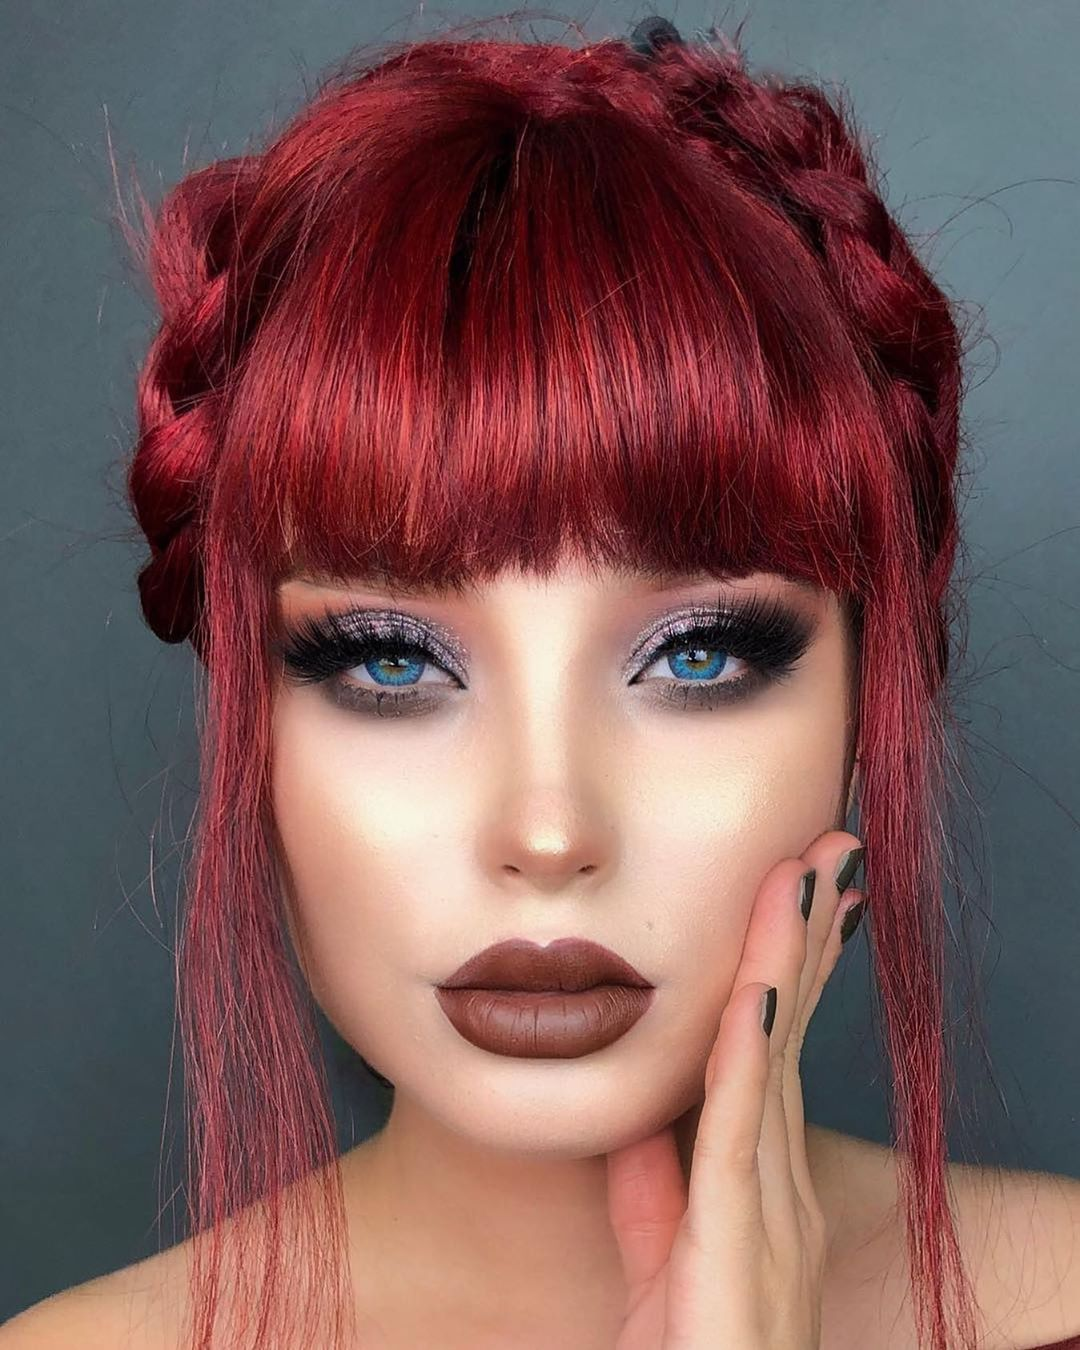 "BeautyVain on Instagram ""ARTIST lupescuevas "" Contact"